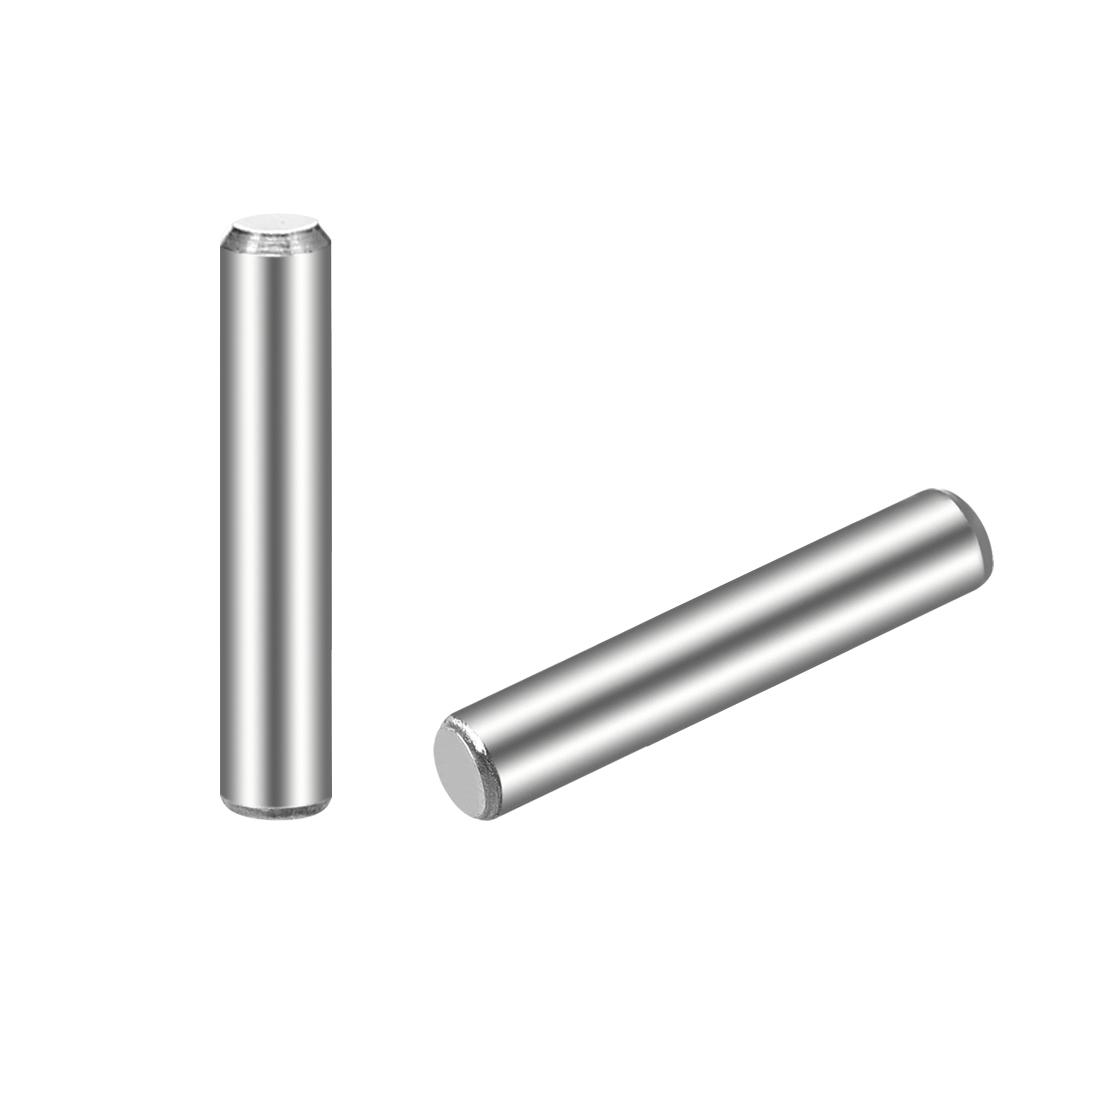 100Pcs 3mm x 16mm Dowel Pin 304 Stainless Steel Shelf Support Pin Fasten